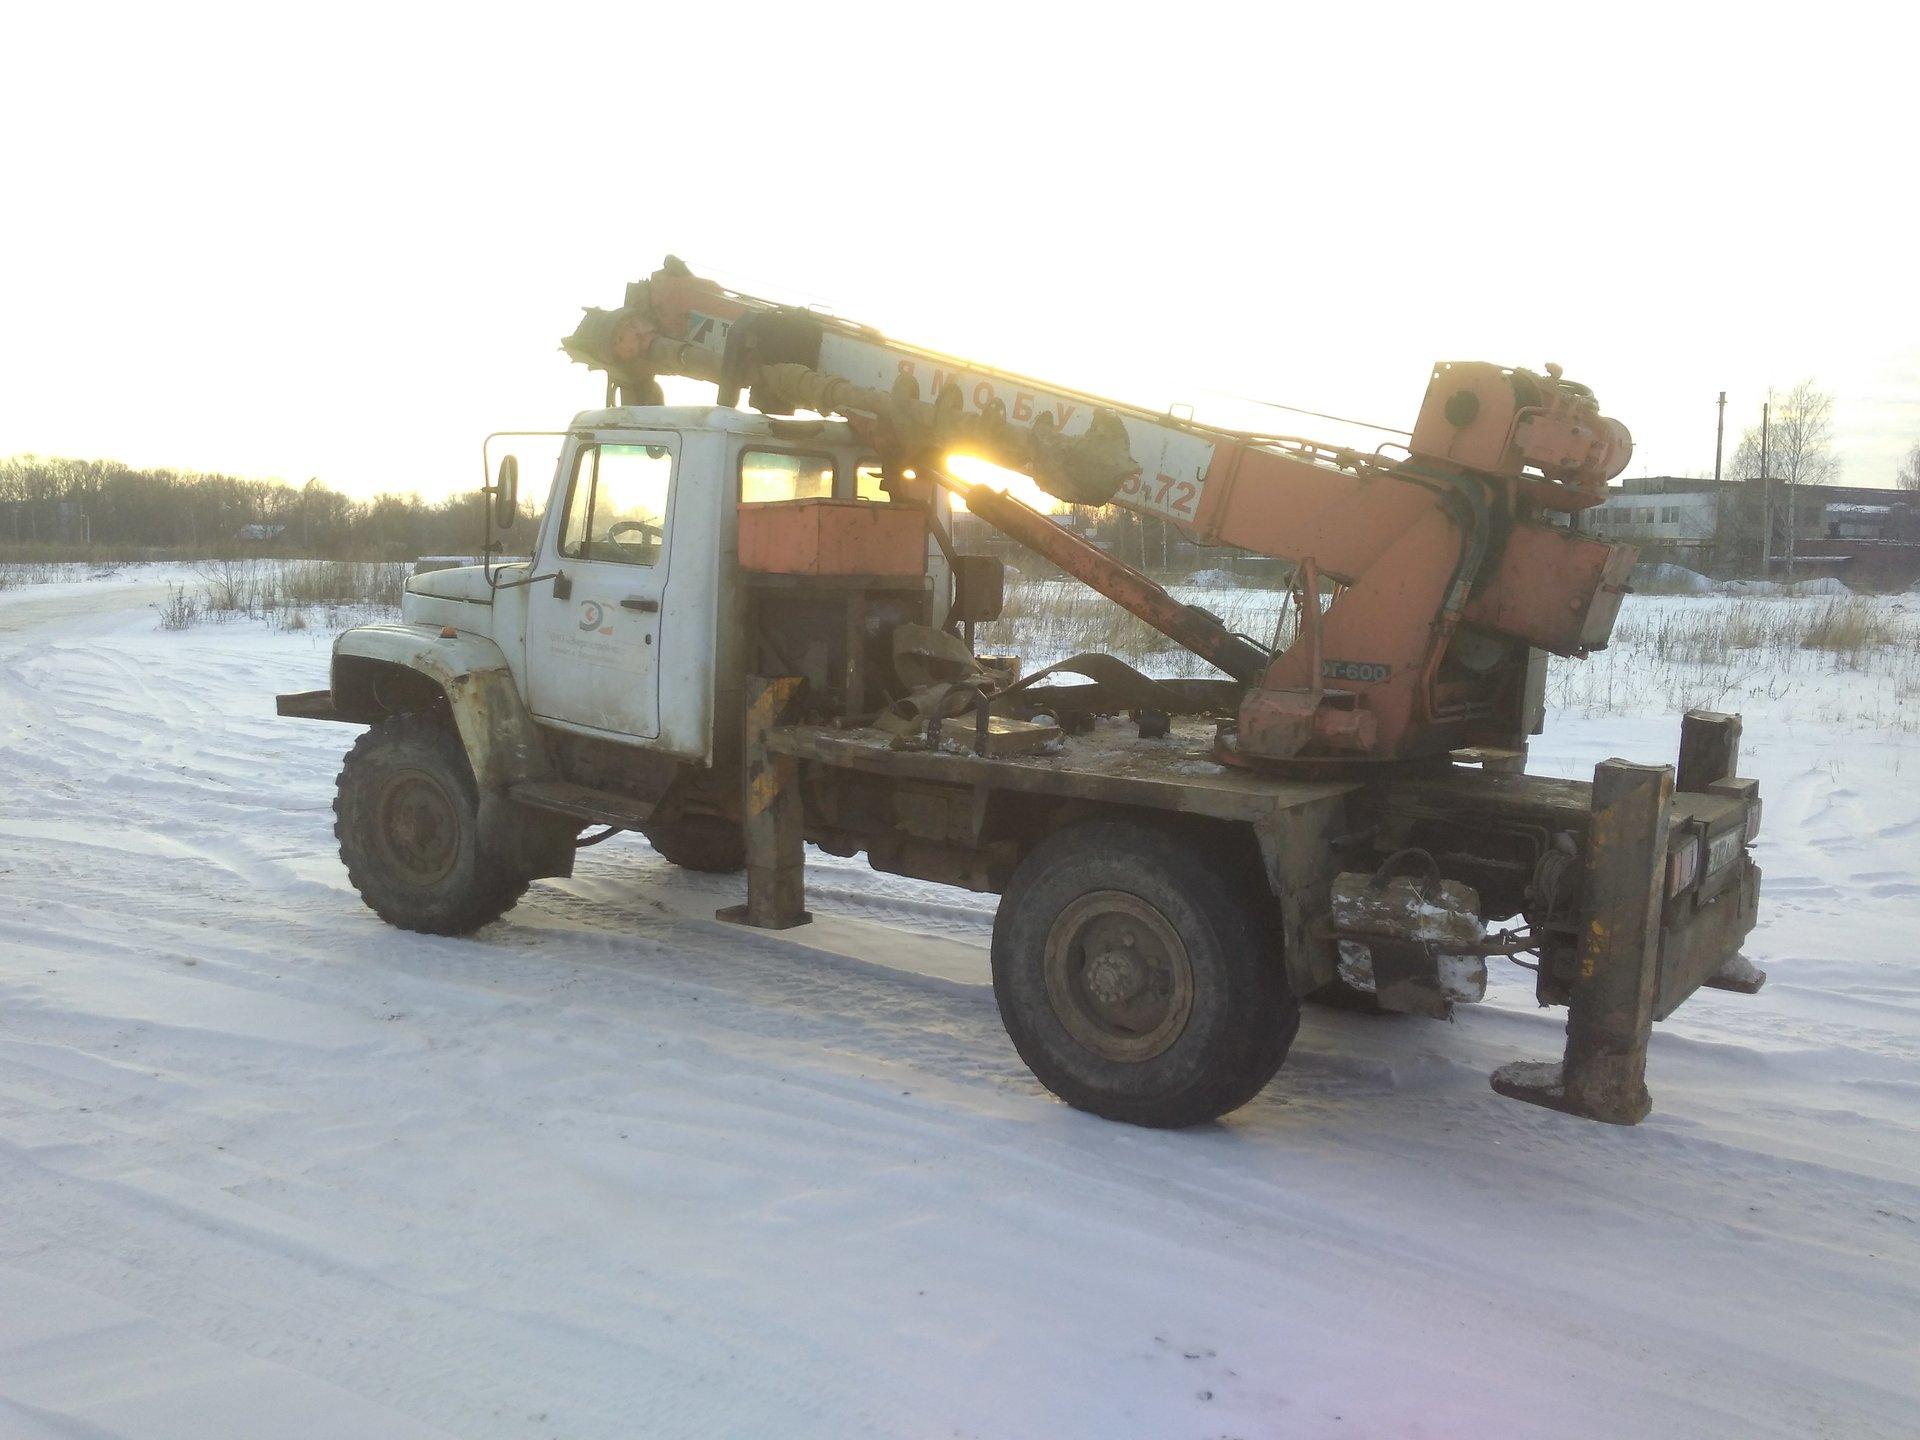 Аренда автобуровой ГАЗ 3308 в Ярославле, глубина бурения до 14м, диаметр до 1200 мм